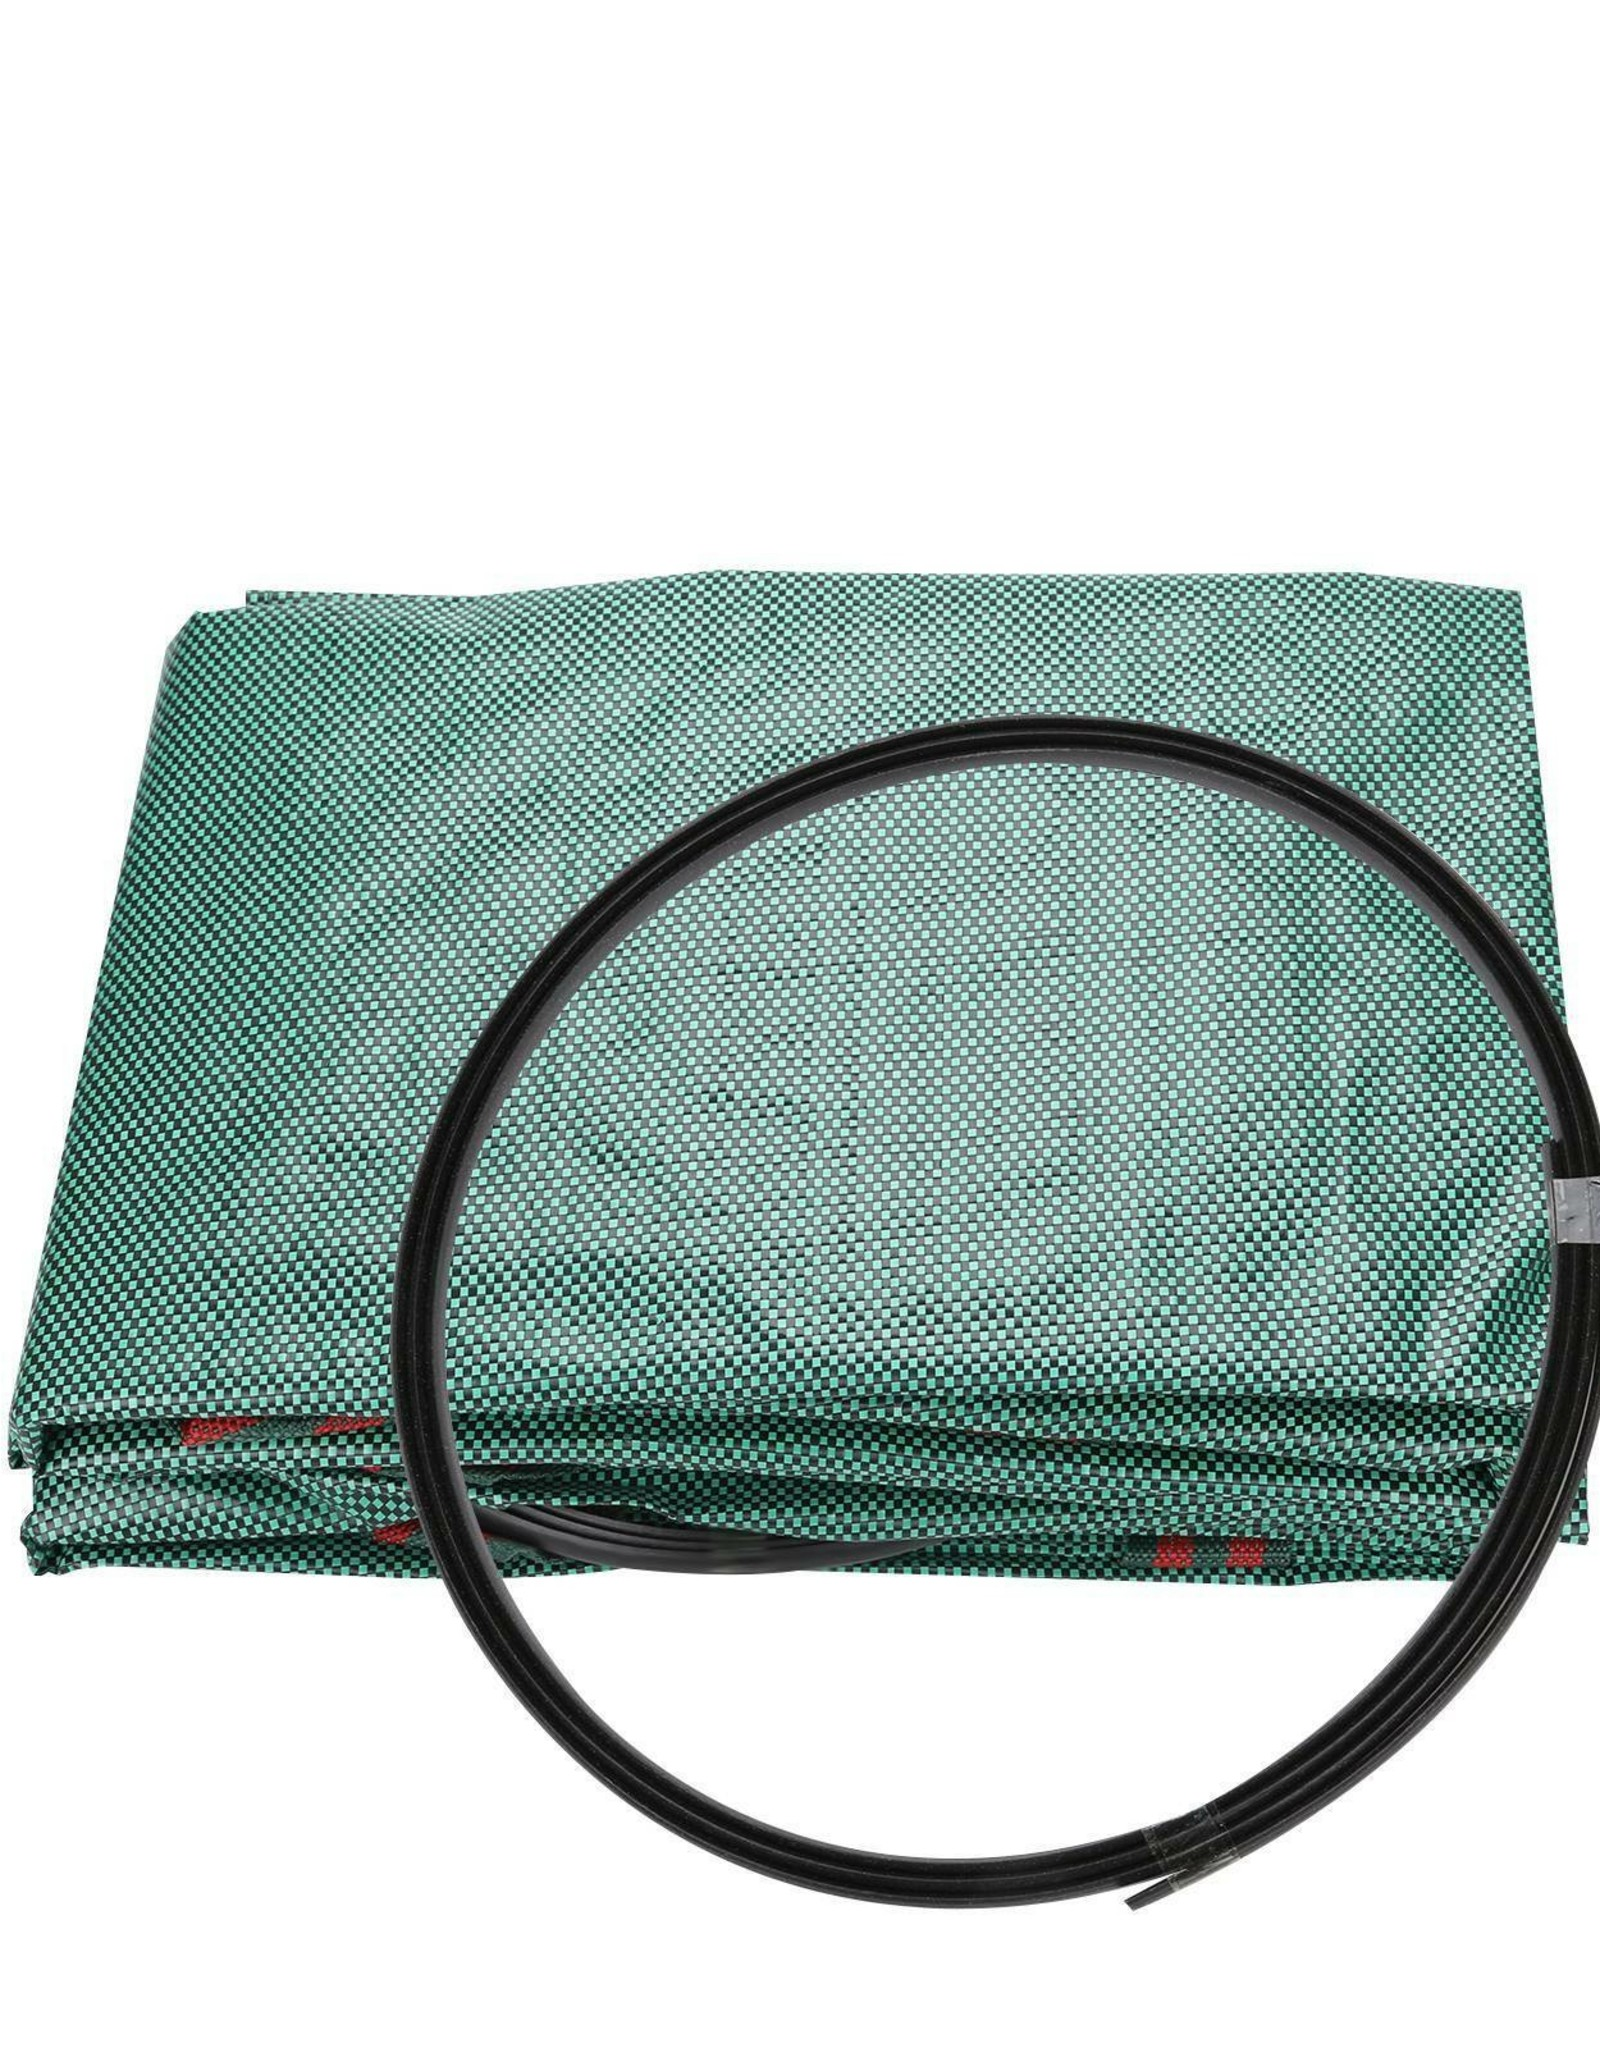 3 x tuinzak, afvalzak, bladzak 76 x 67 cm